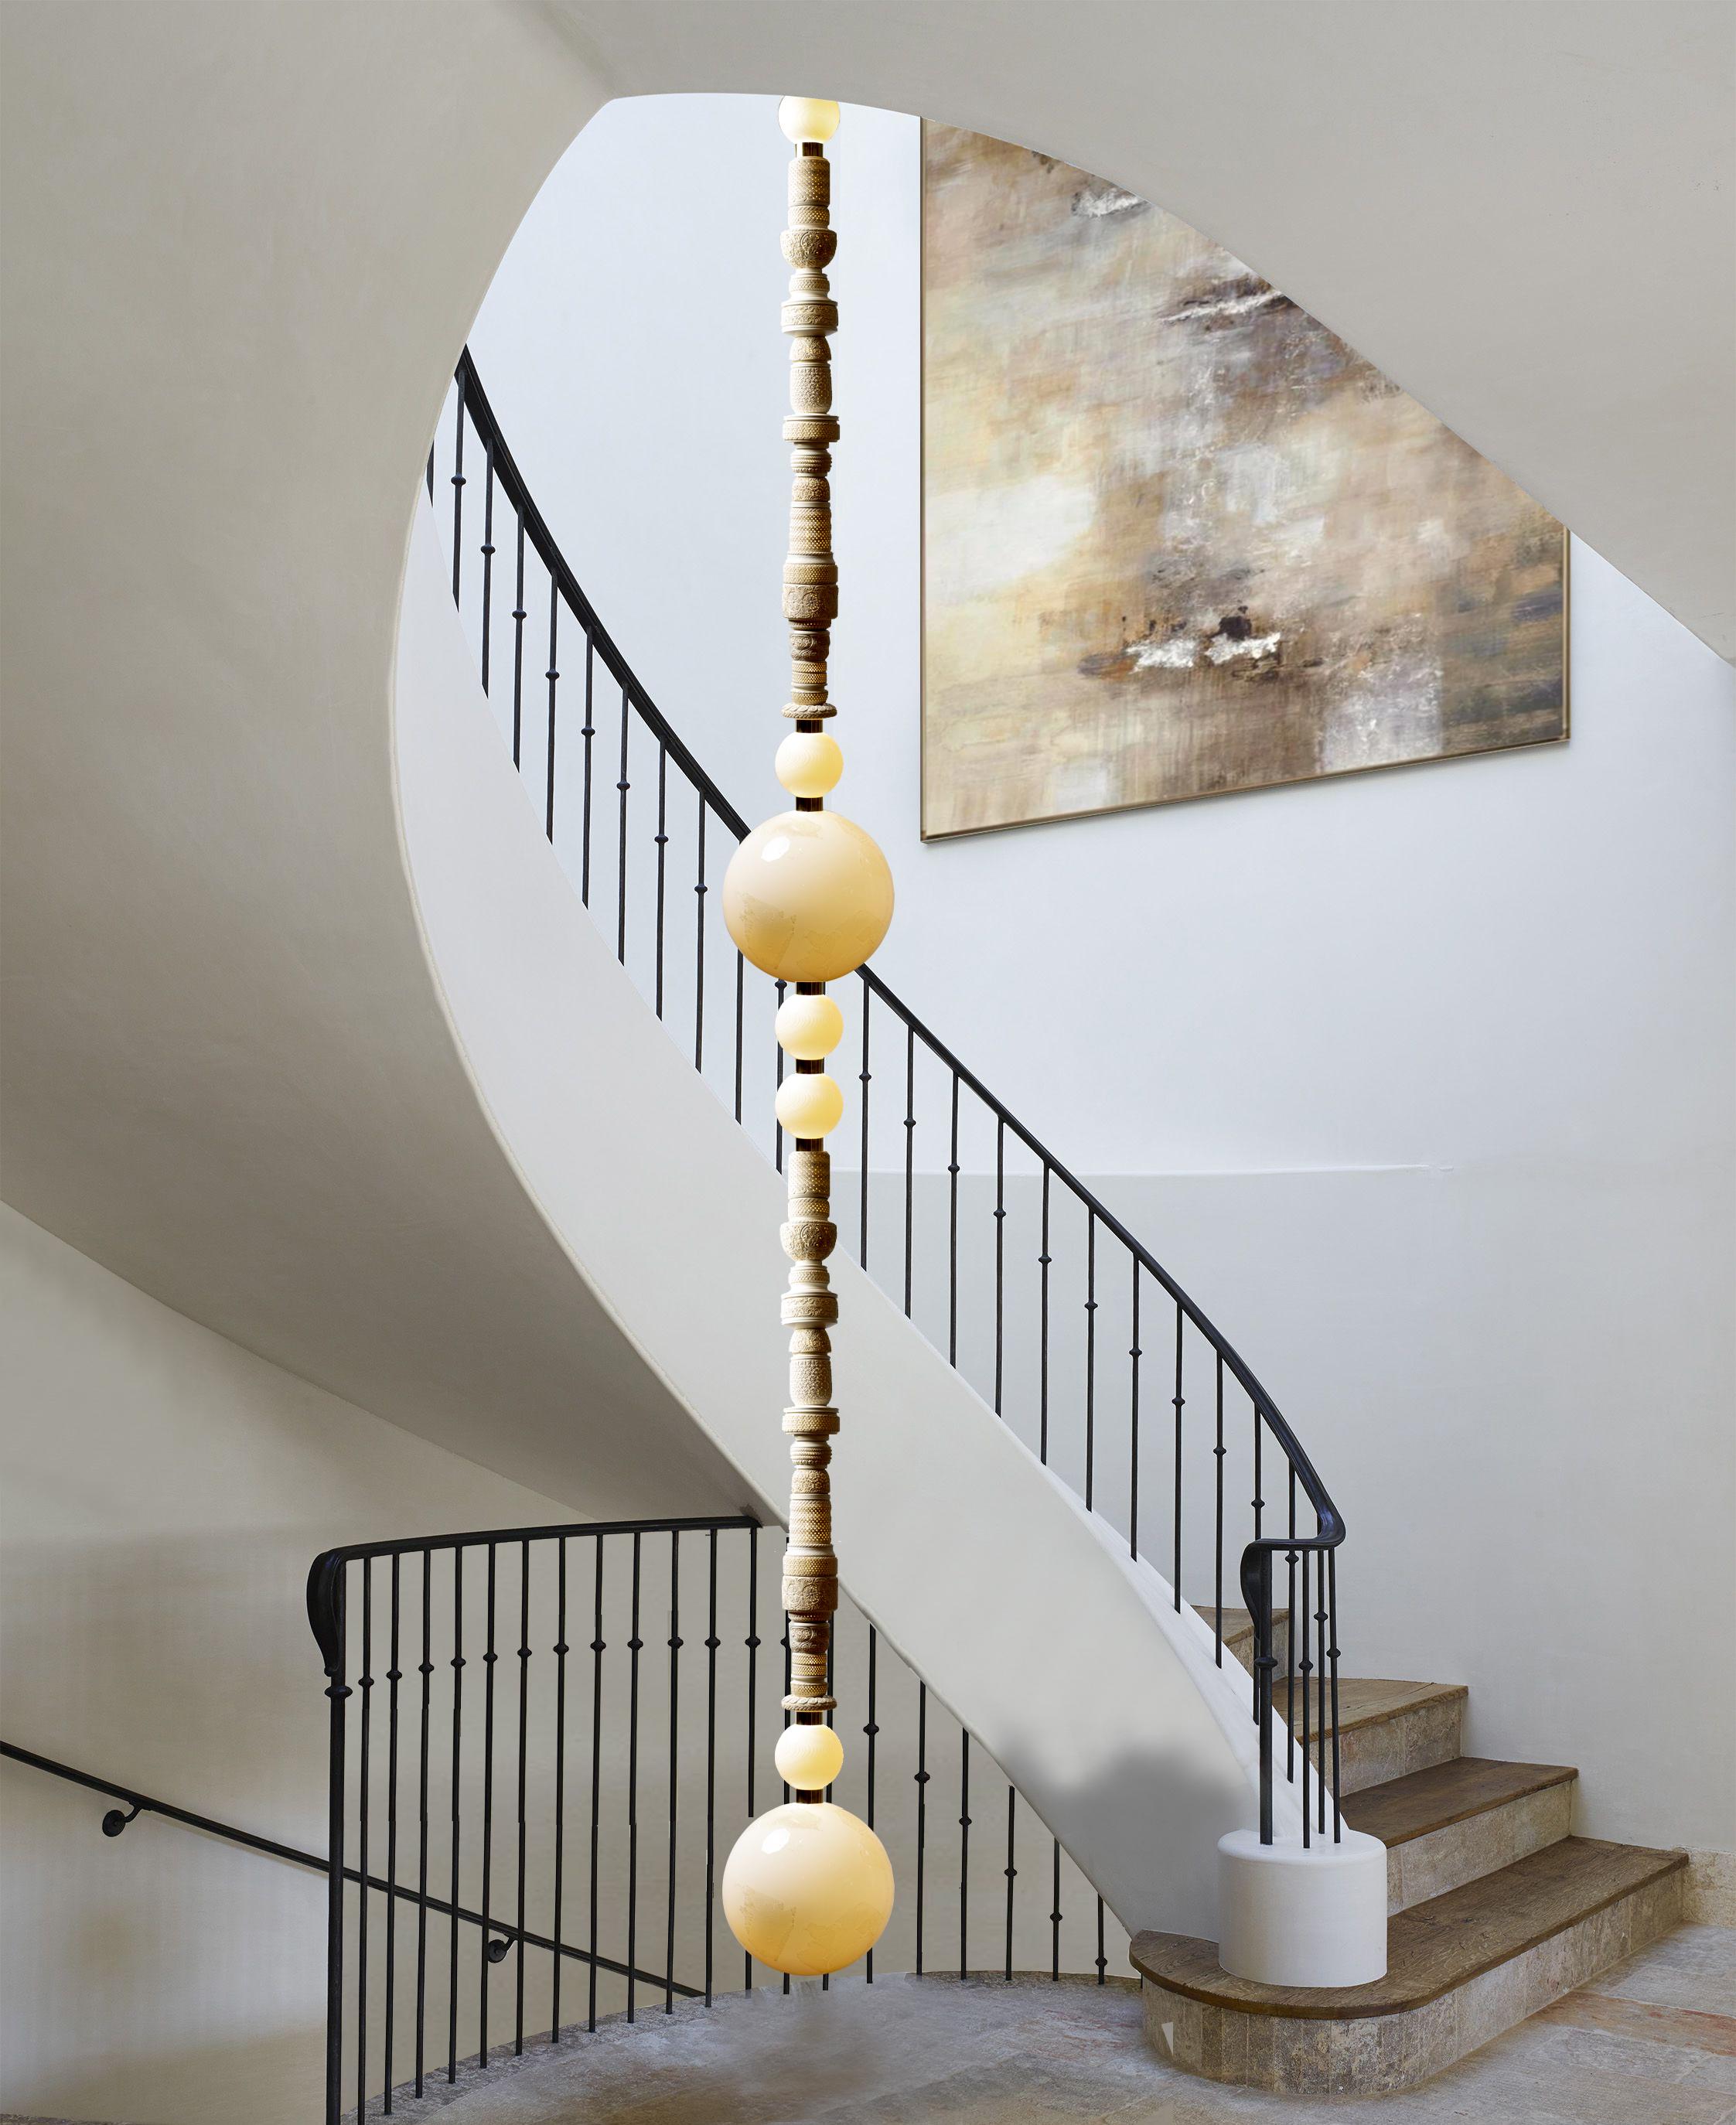 Meerschaum down staircase.jpg